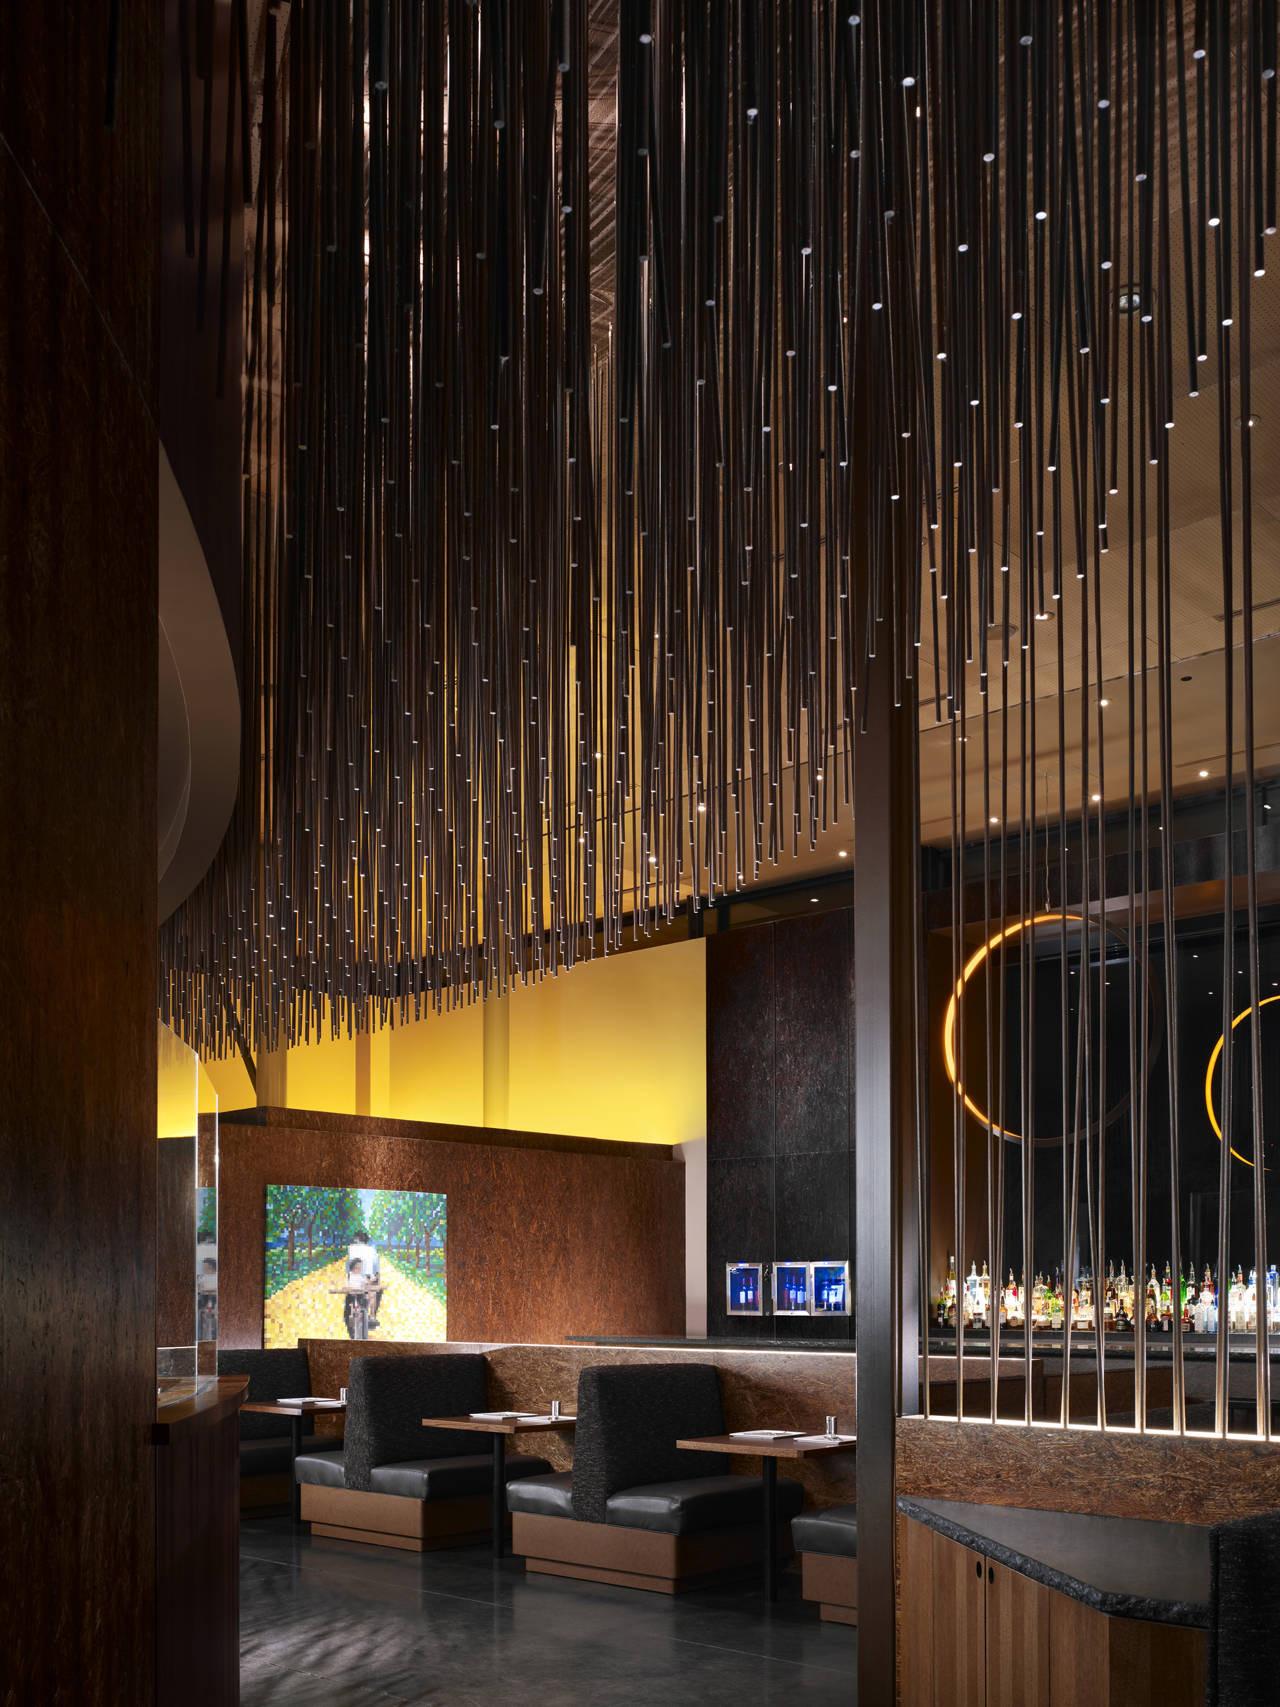 Cafe 501 / Elliott + Associates Architects, © Scott McDonald